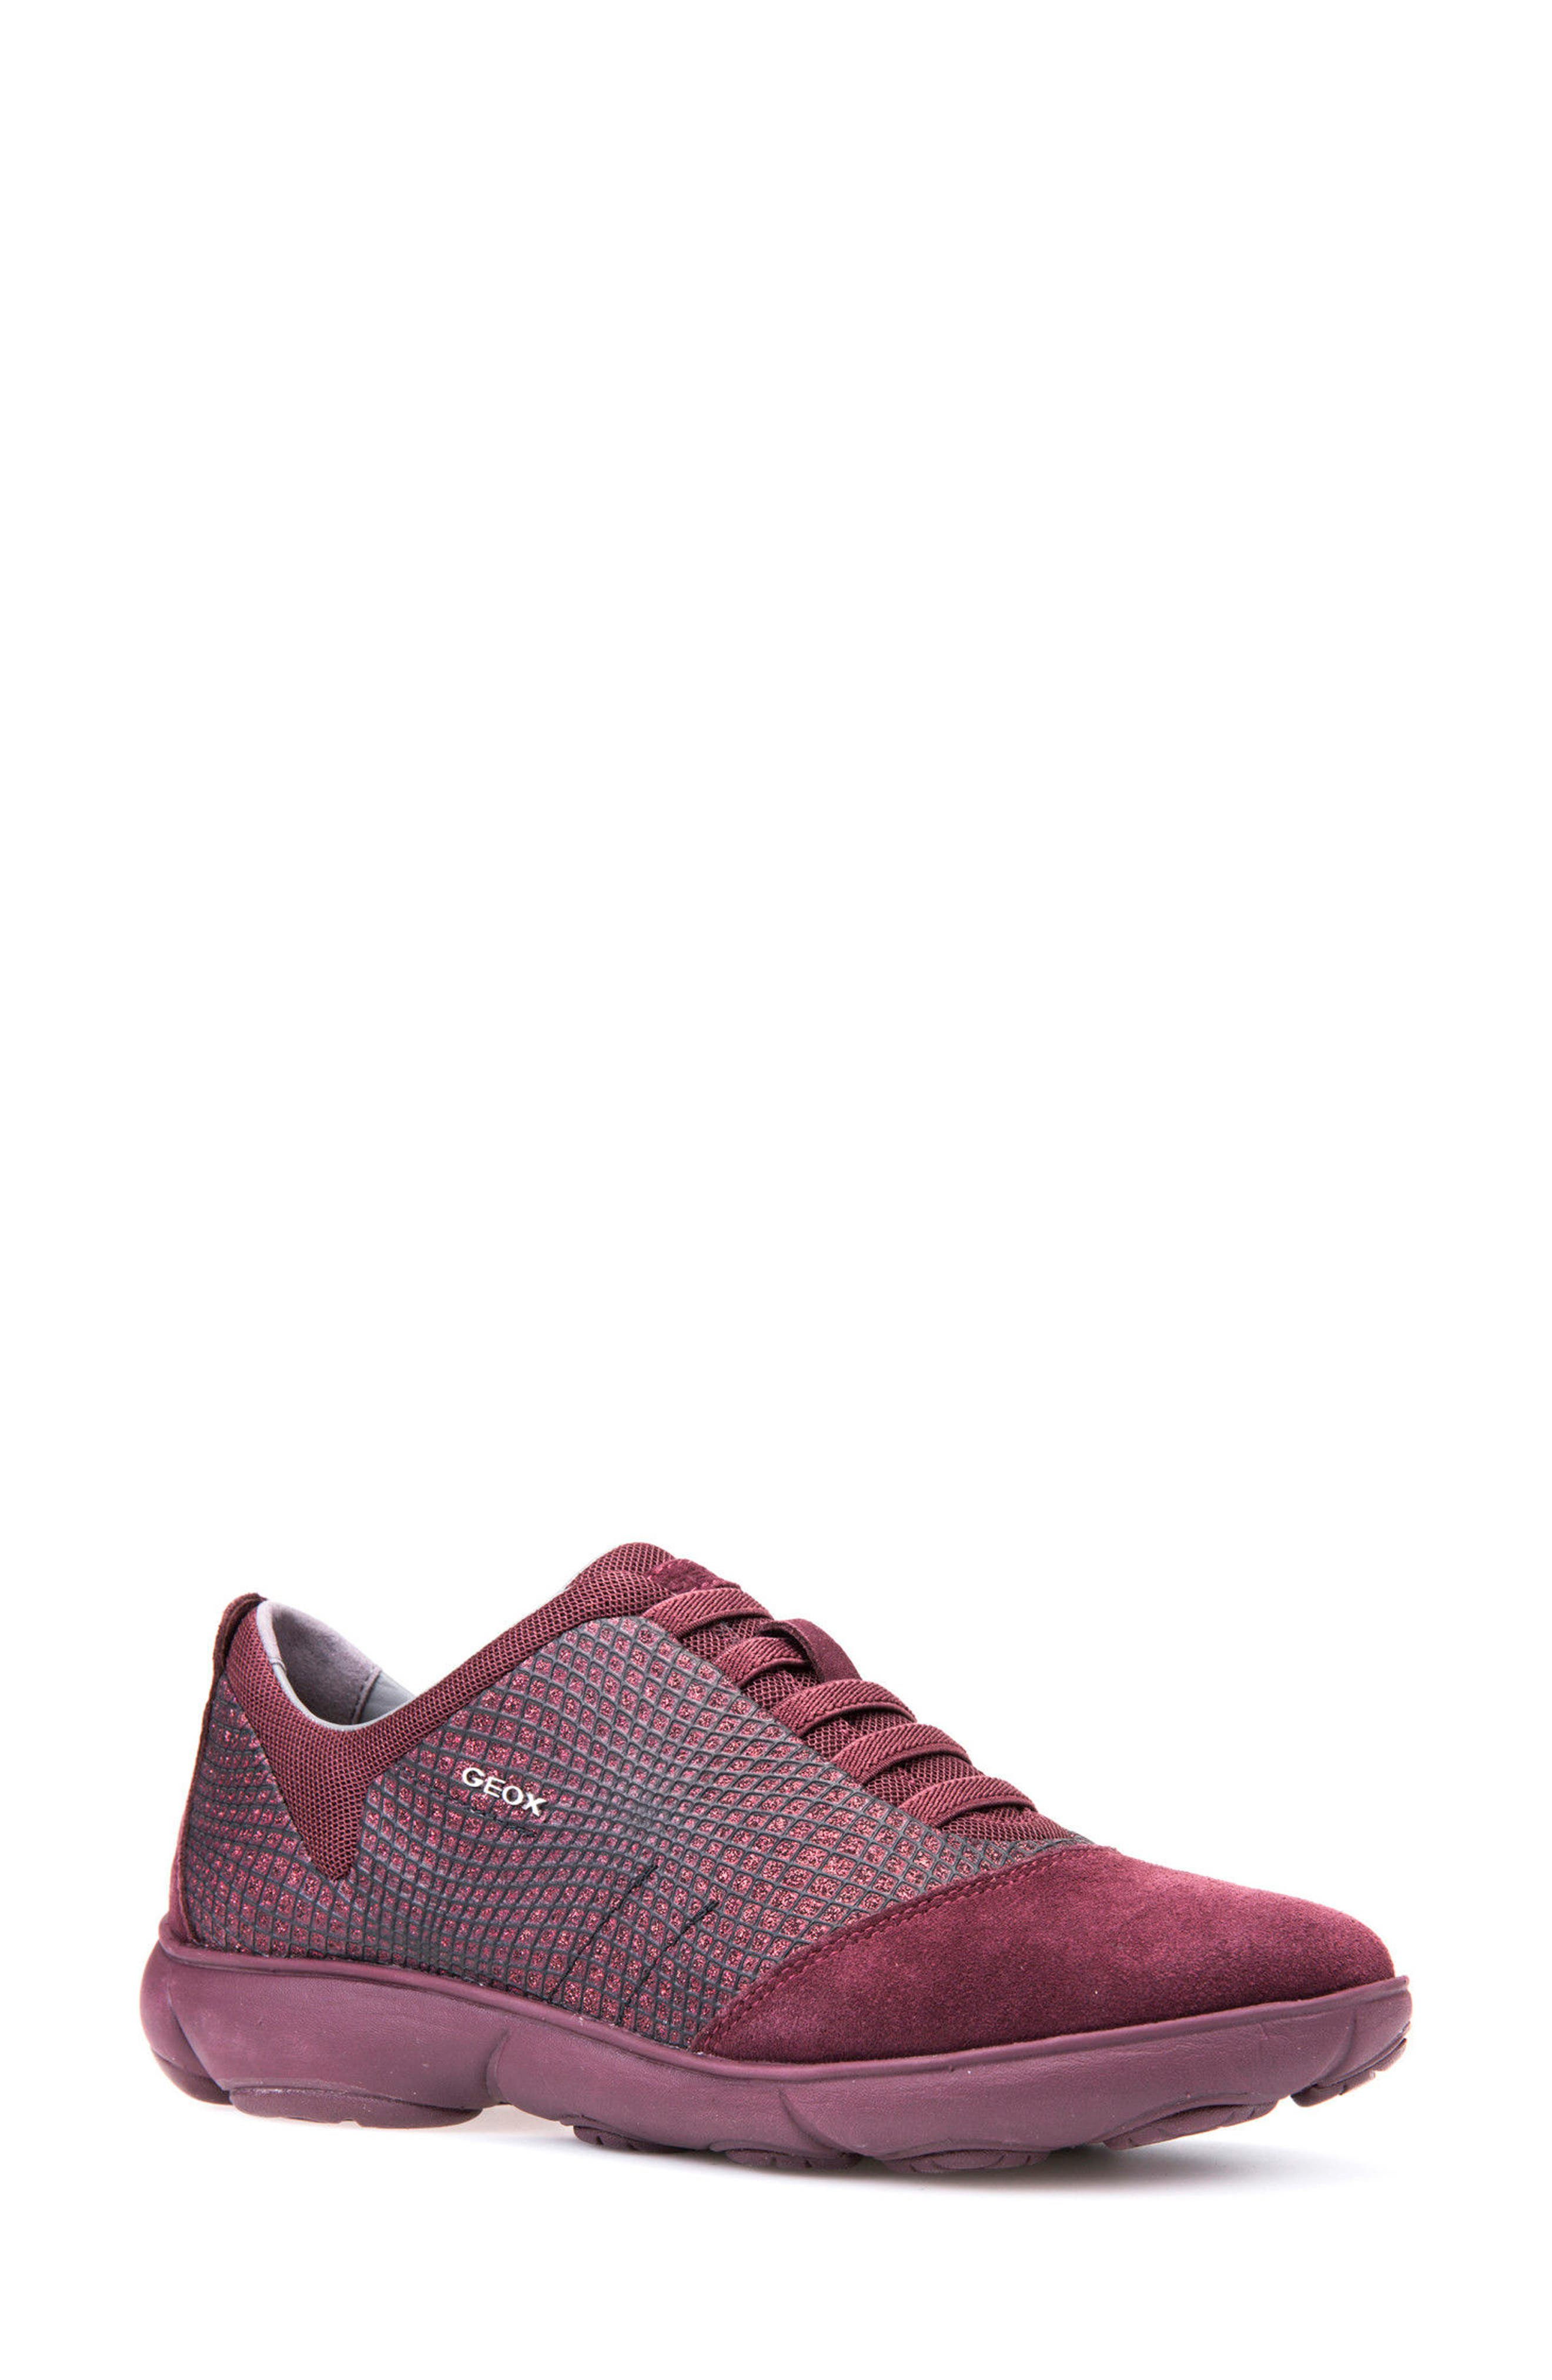 Alternate Image 1 Selected - Geox Nebula Slip-On Sneaker (Women)